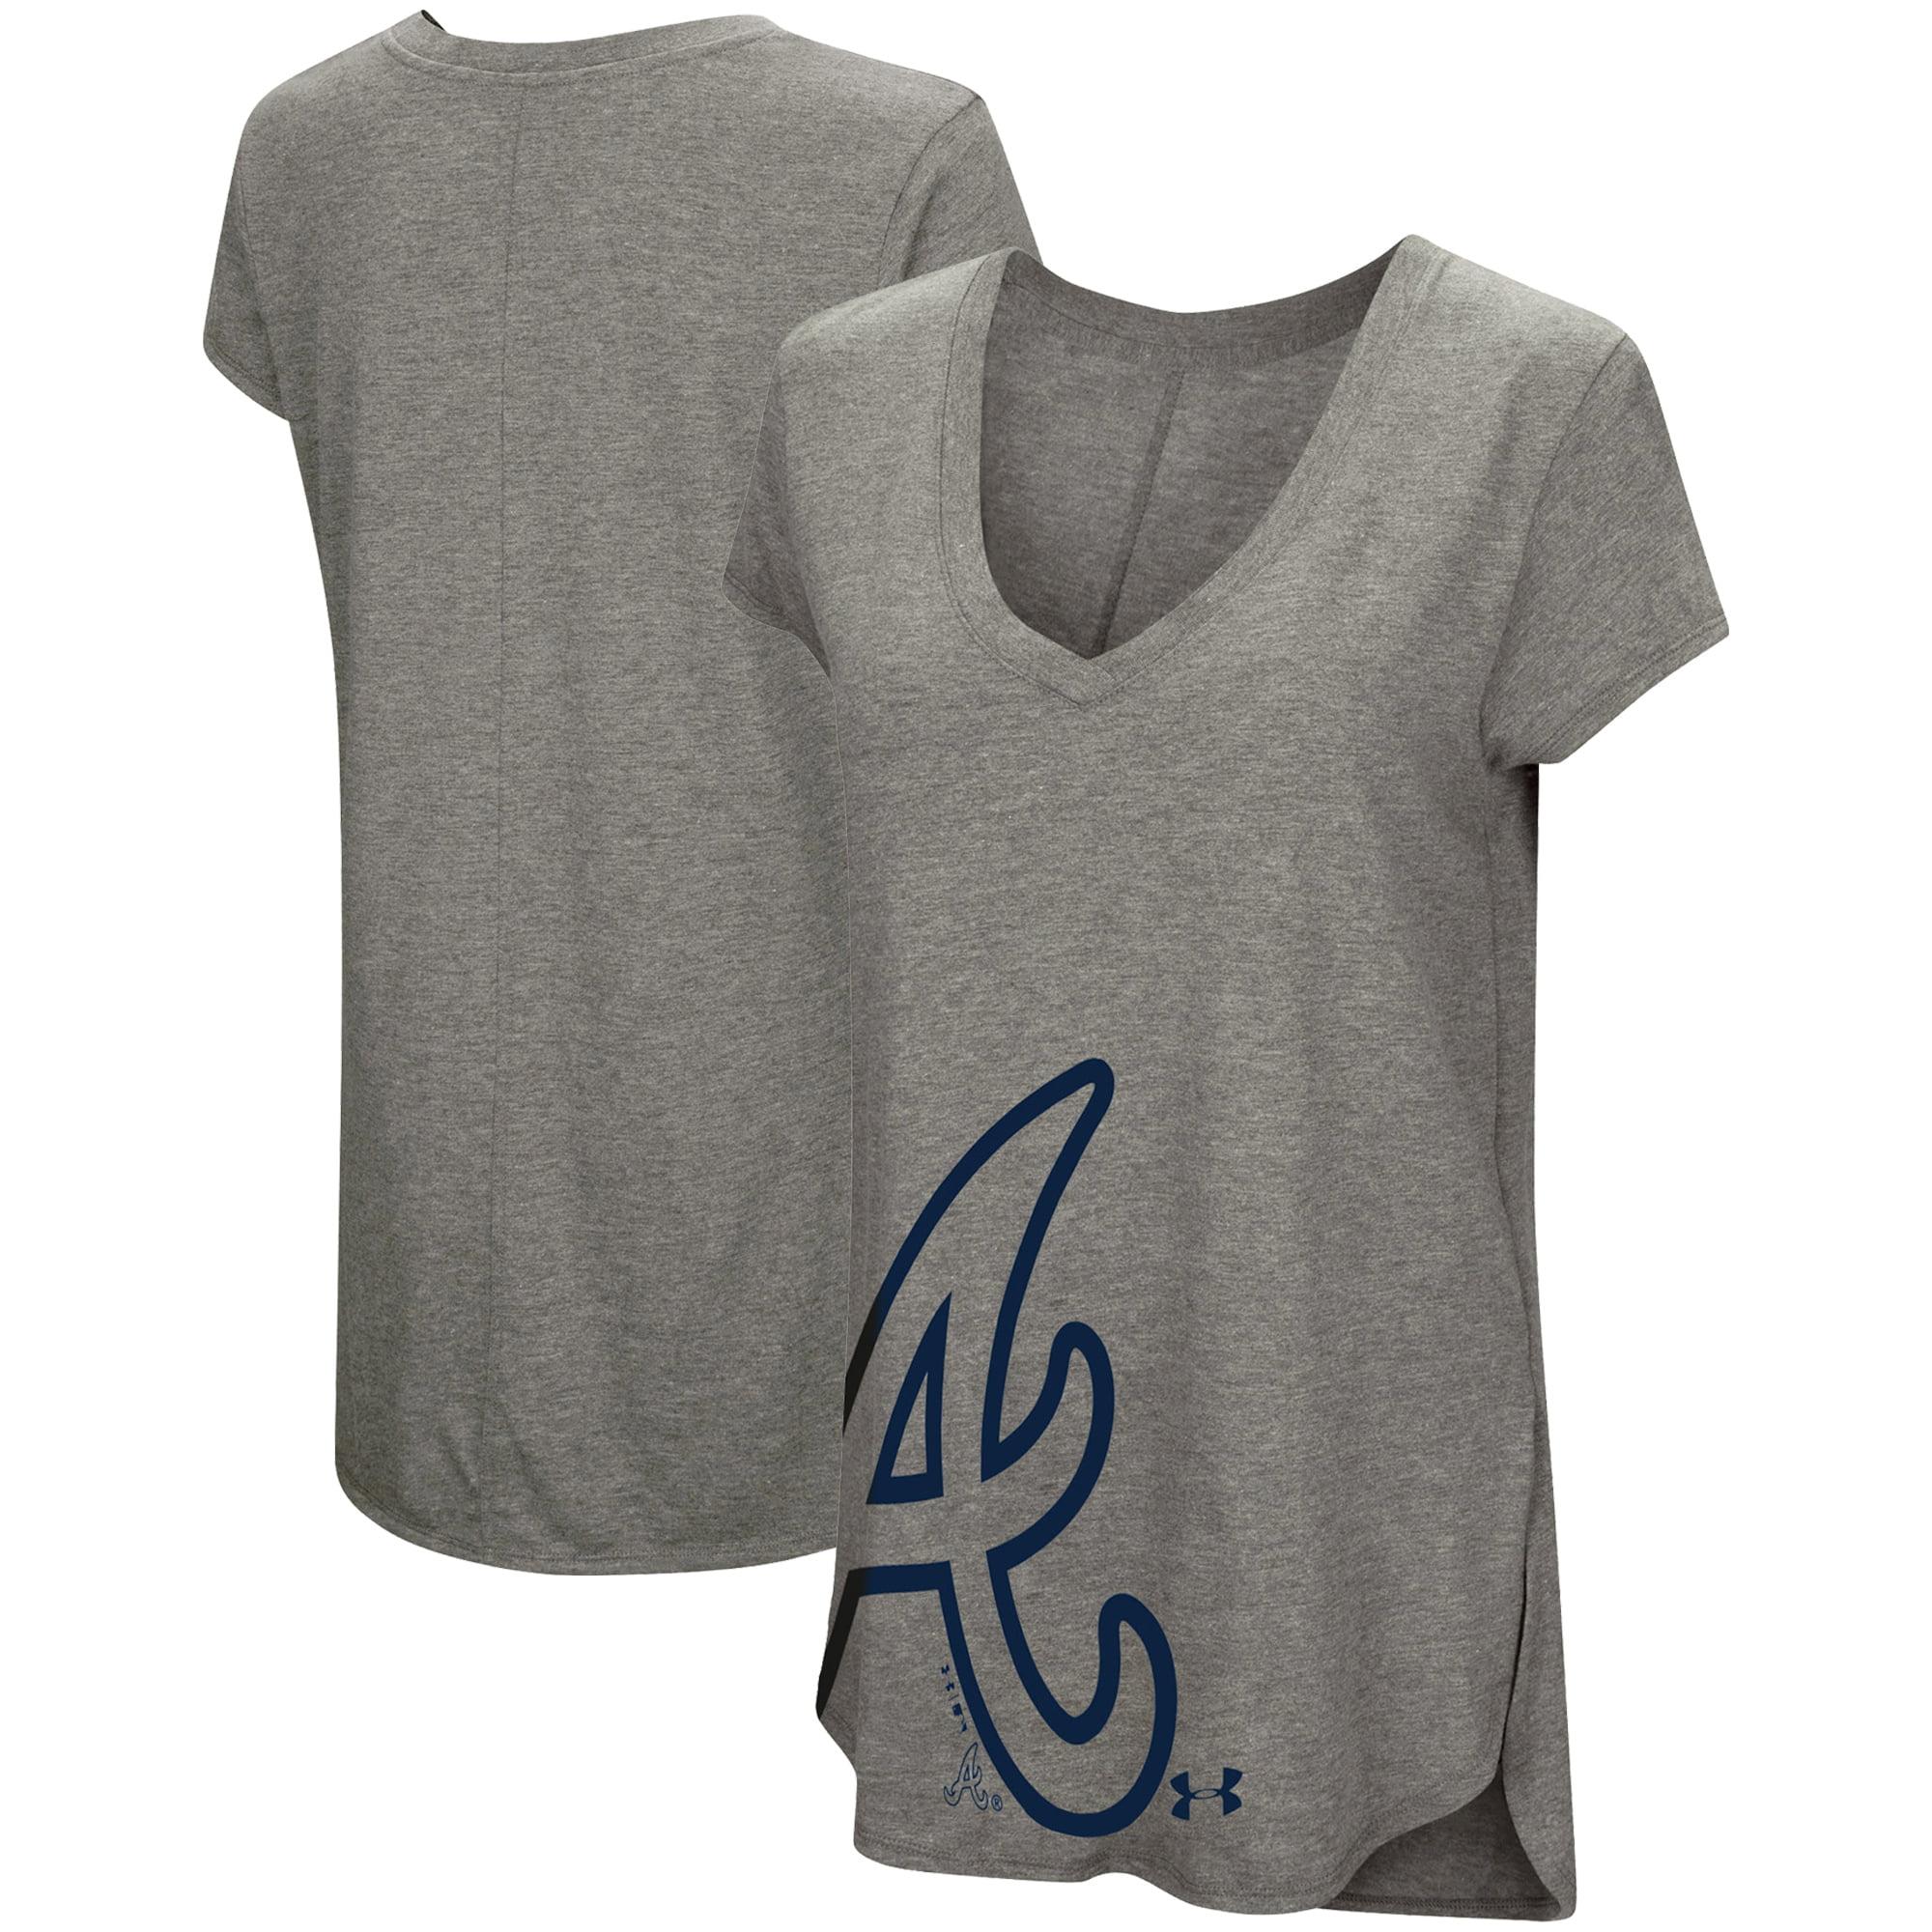 Atlanta Braves Under Armour Women's Pride Offset Logo V-Neck Performance Tri-Blend T-Shirt - Heathered Gray